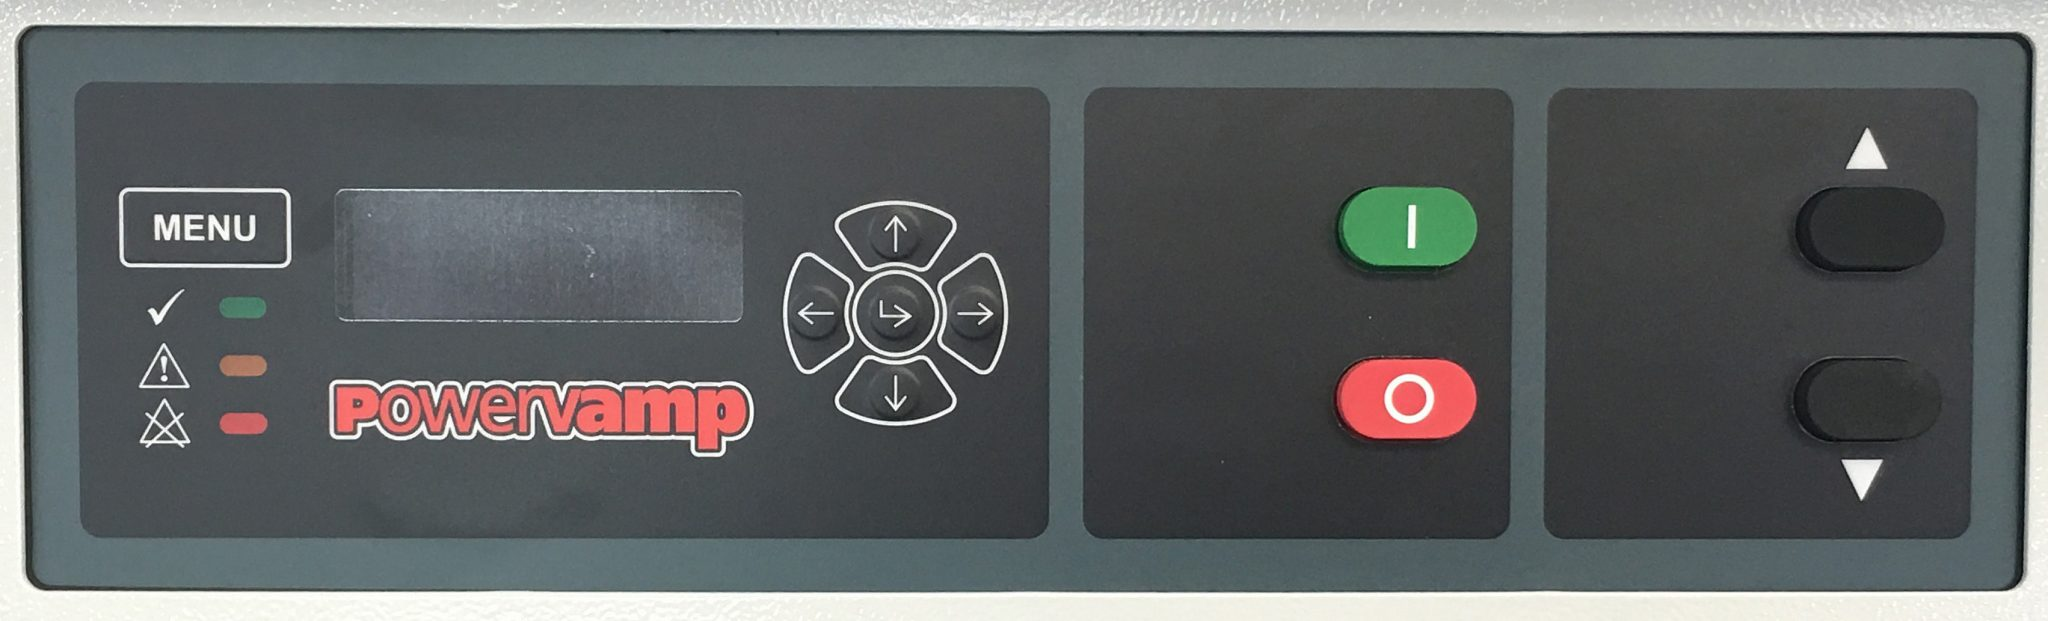 PV45 interface